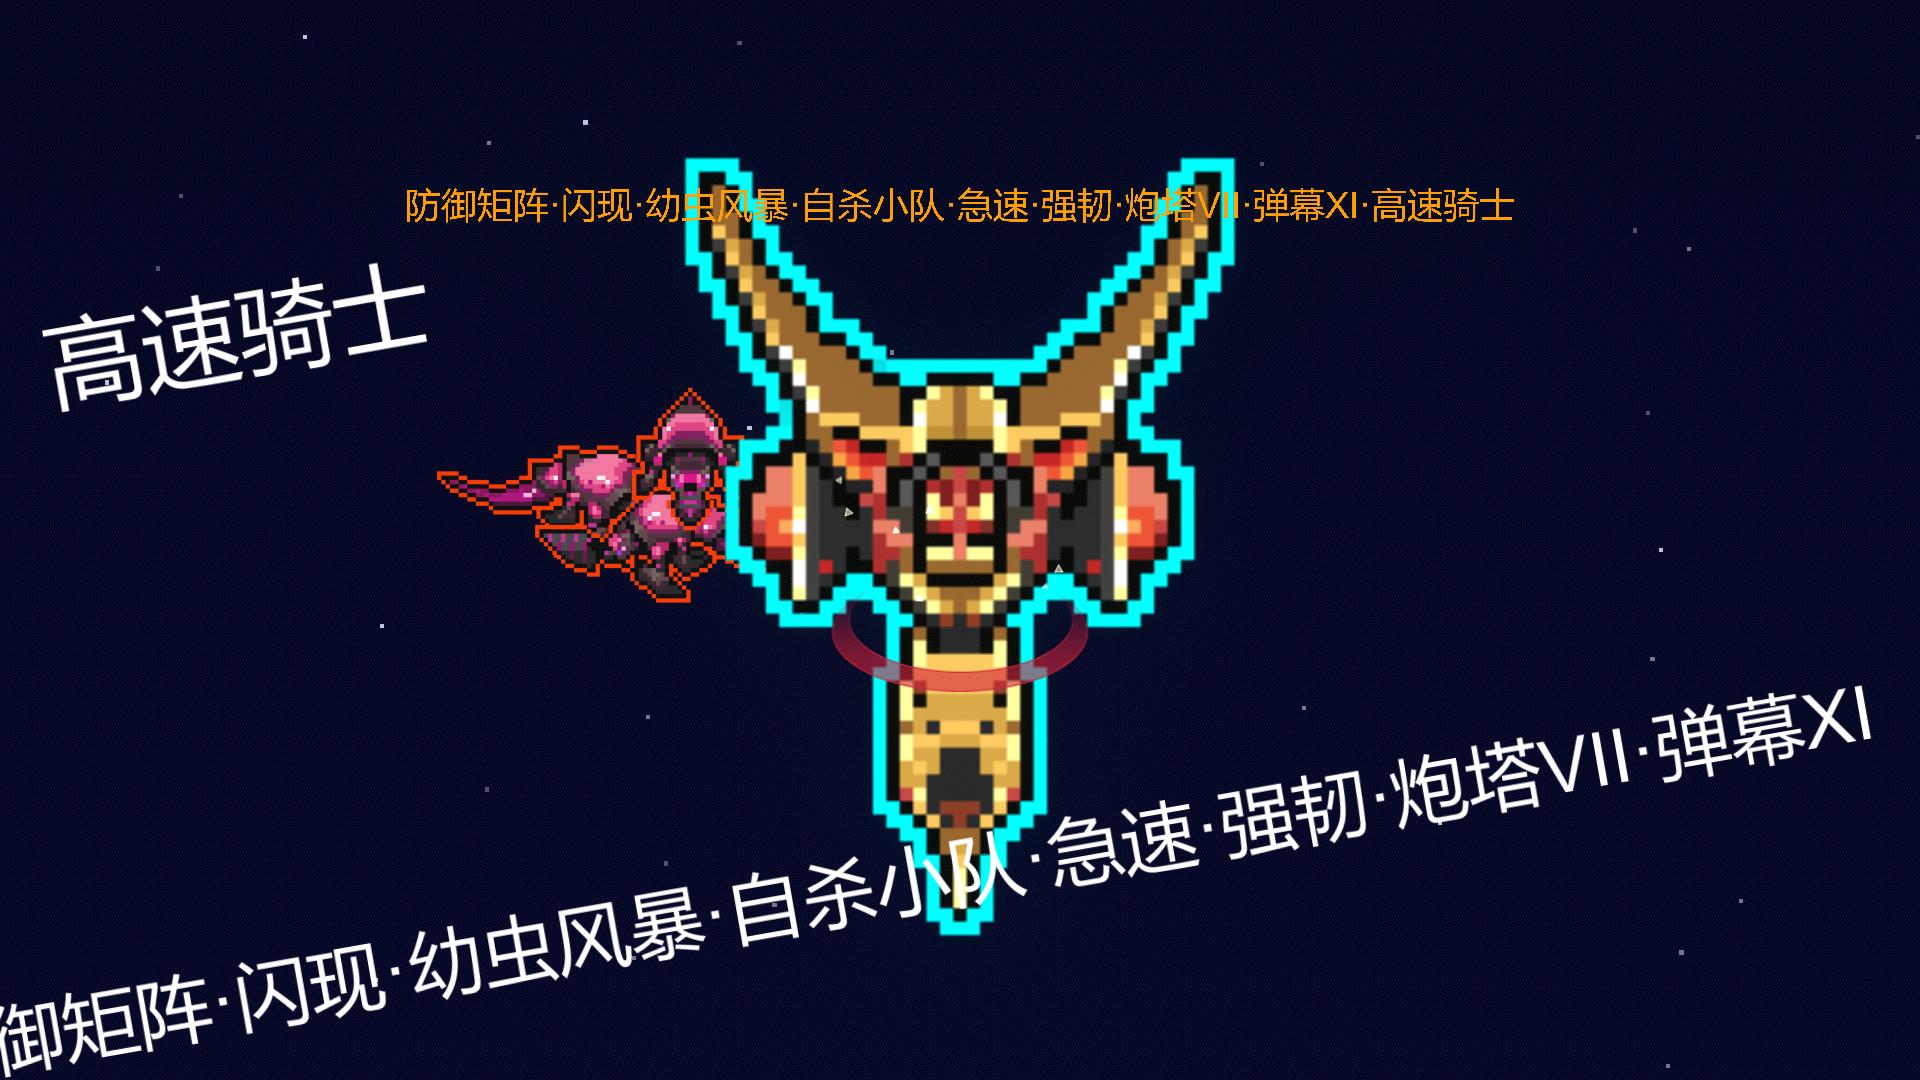 Strike Buster Prototype screenshot